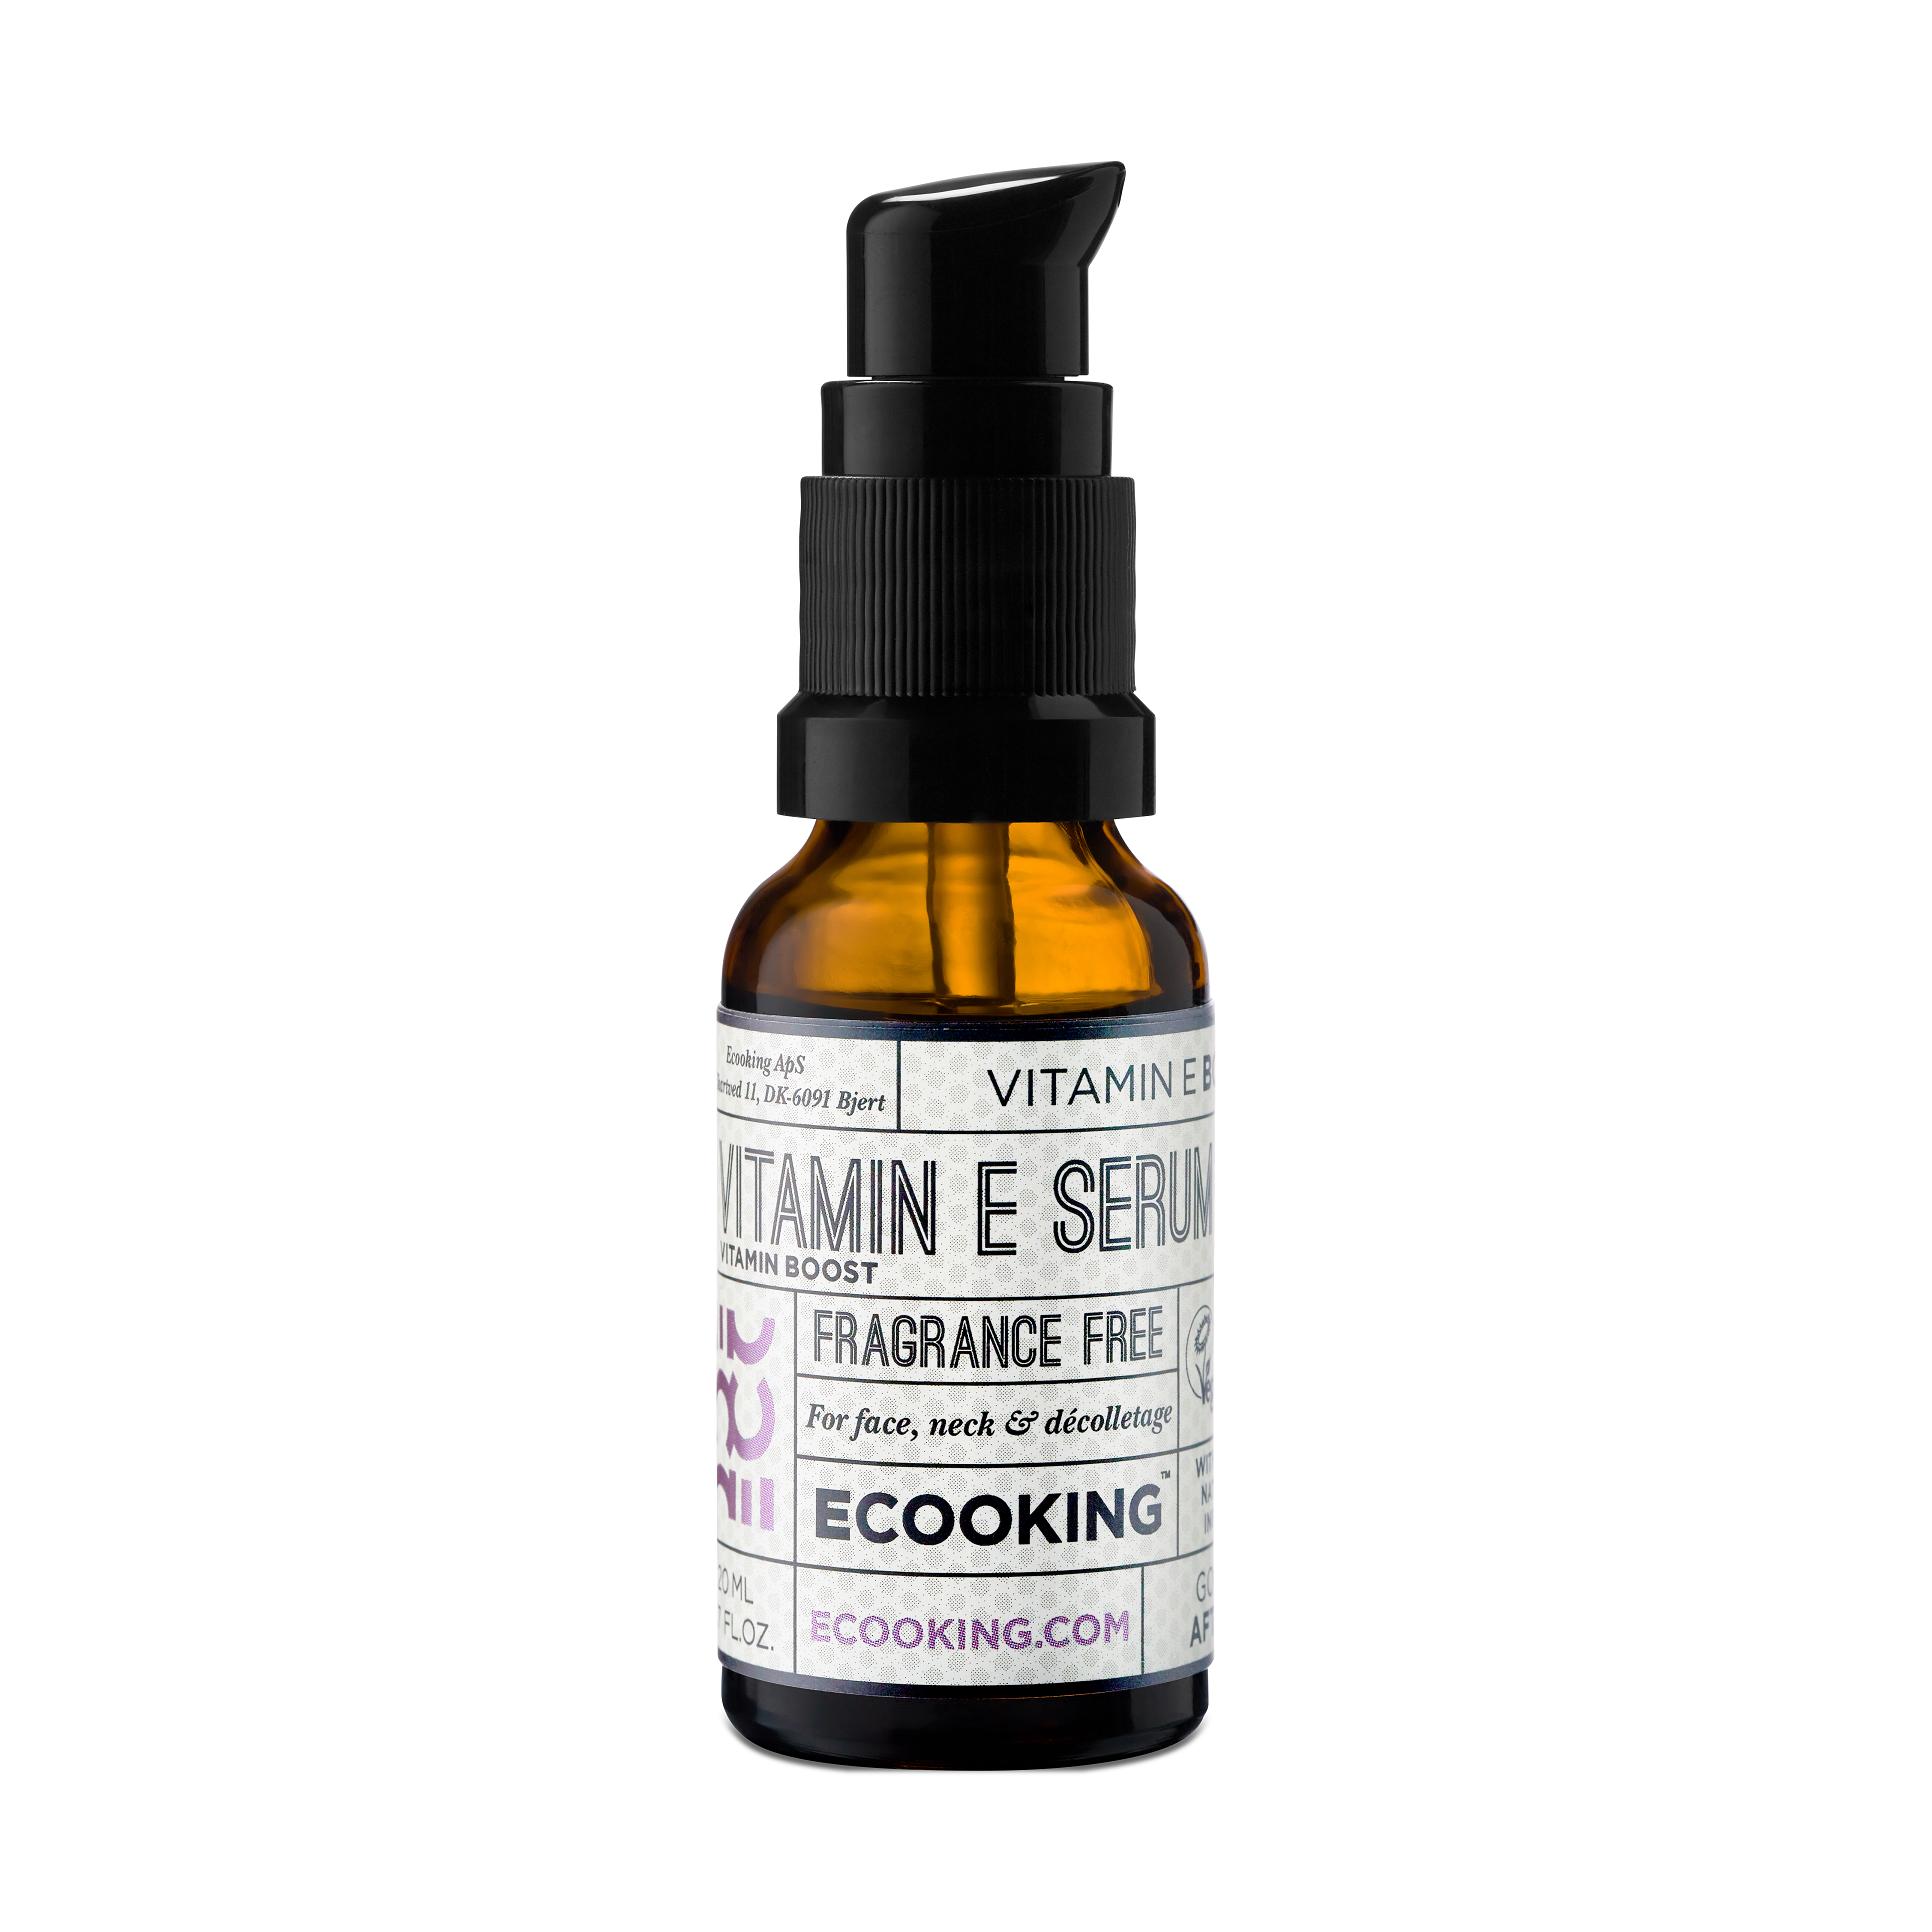 Ecooking - Vitamin E Serum 20 ml